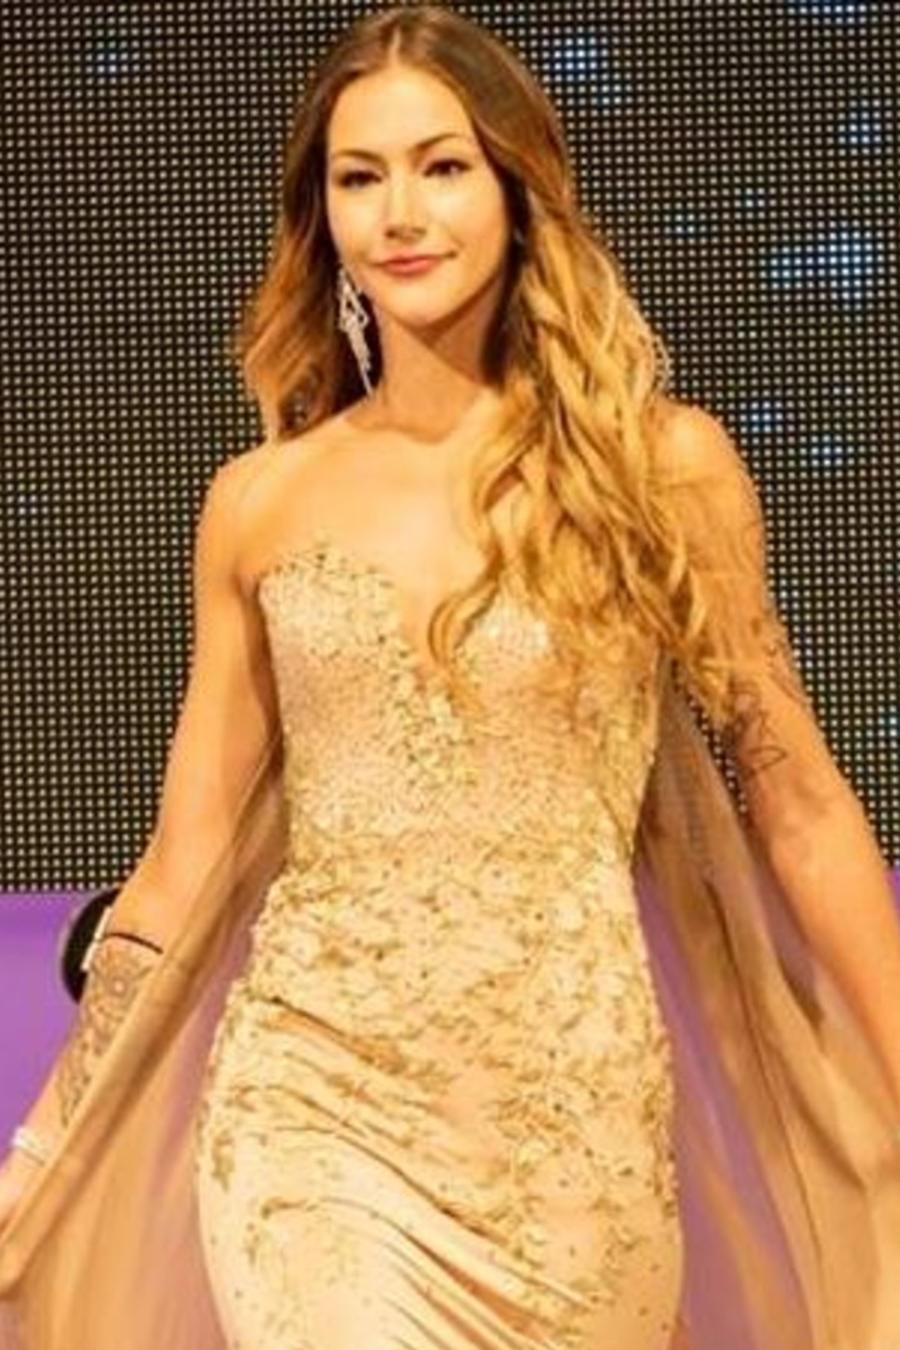 Amber-Lee Friis